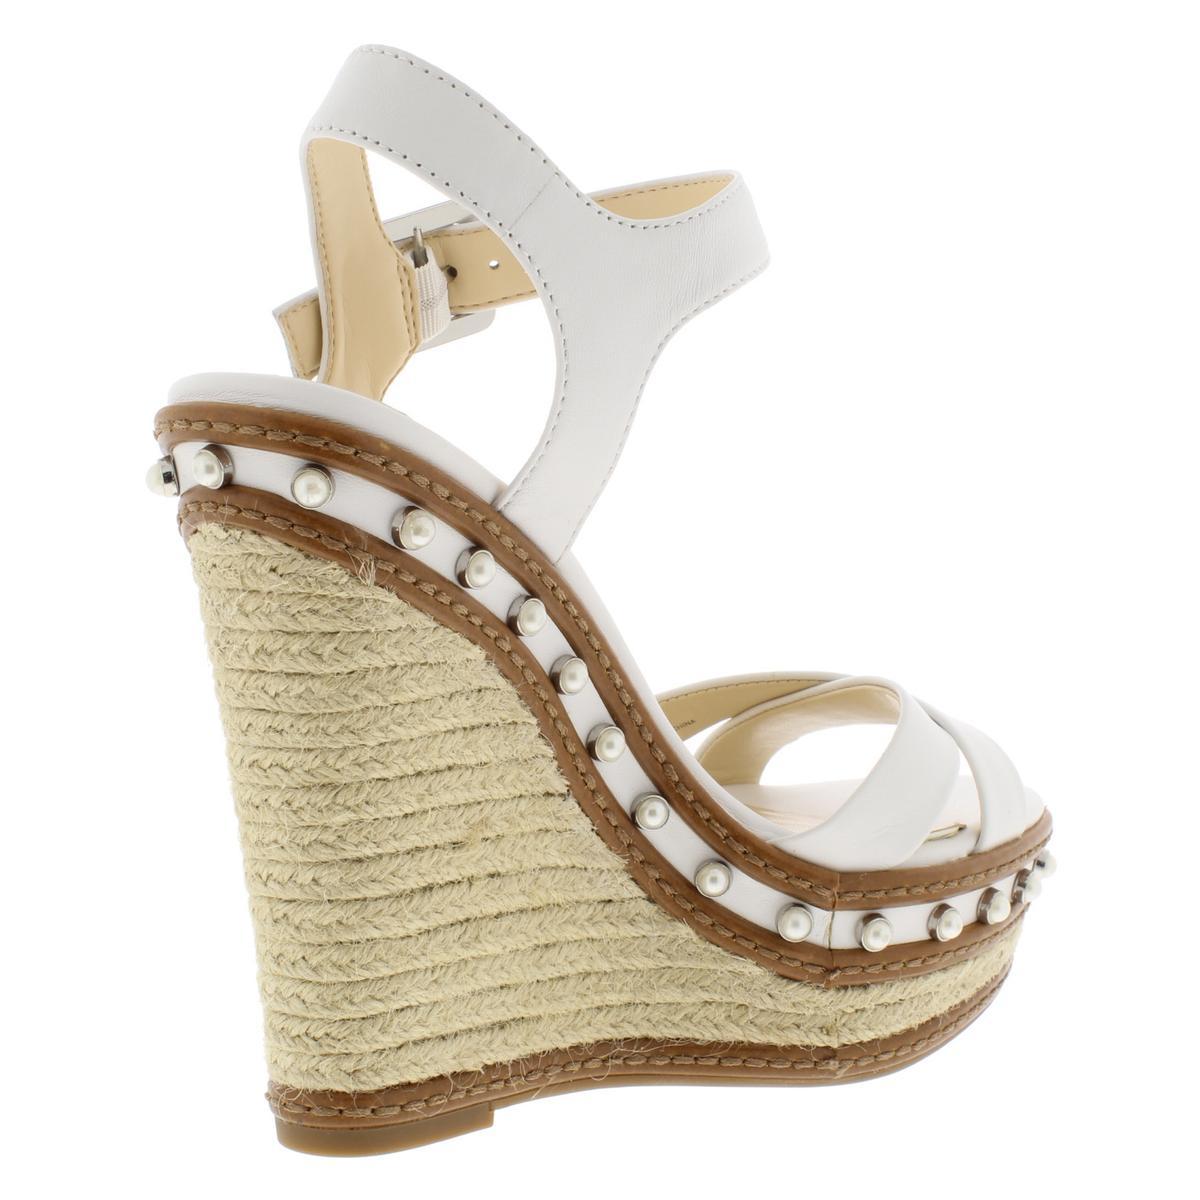 Jessica-Simpson-Womens-Aeralin-Leather-Espadrilles-Wedges-Shoes-BHFO-6006 thumbnail 6